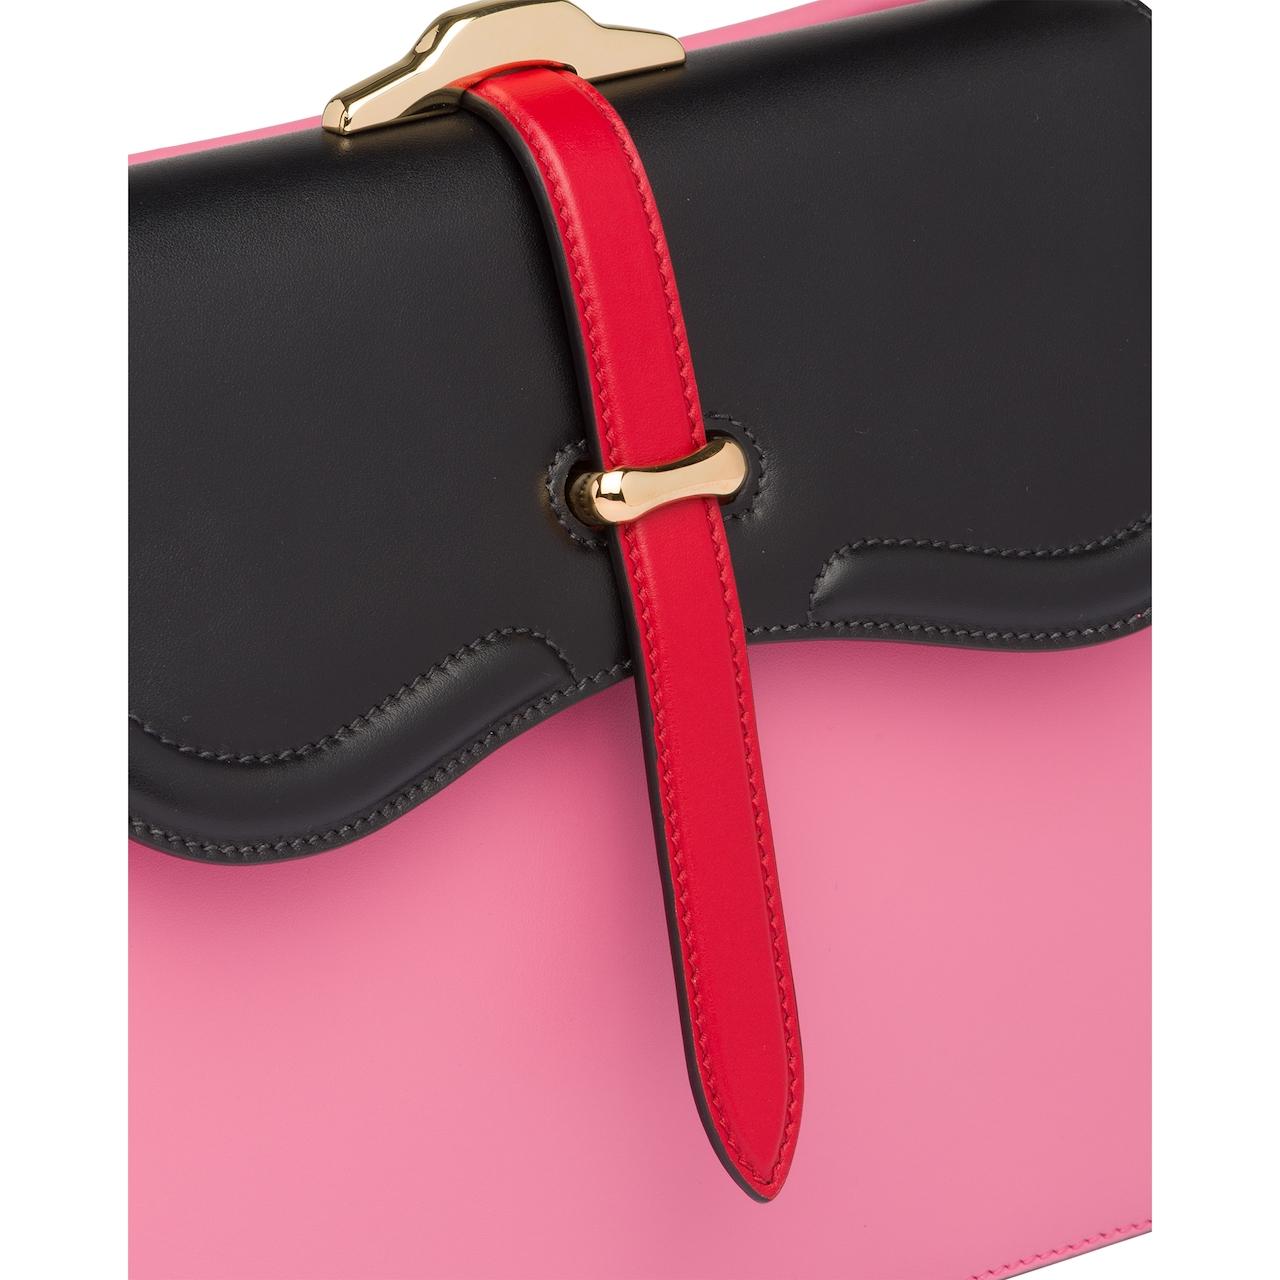 Prada Belle leather bag